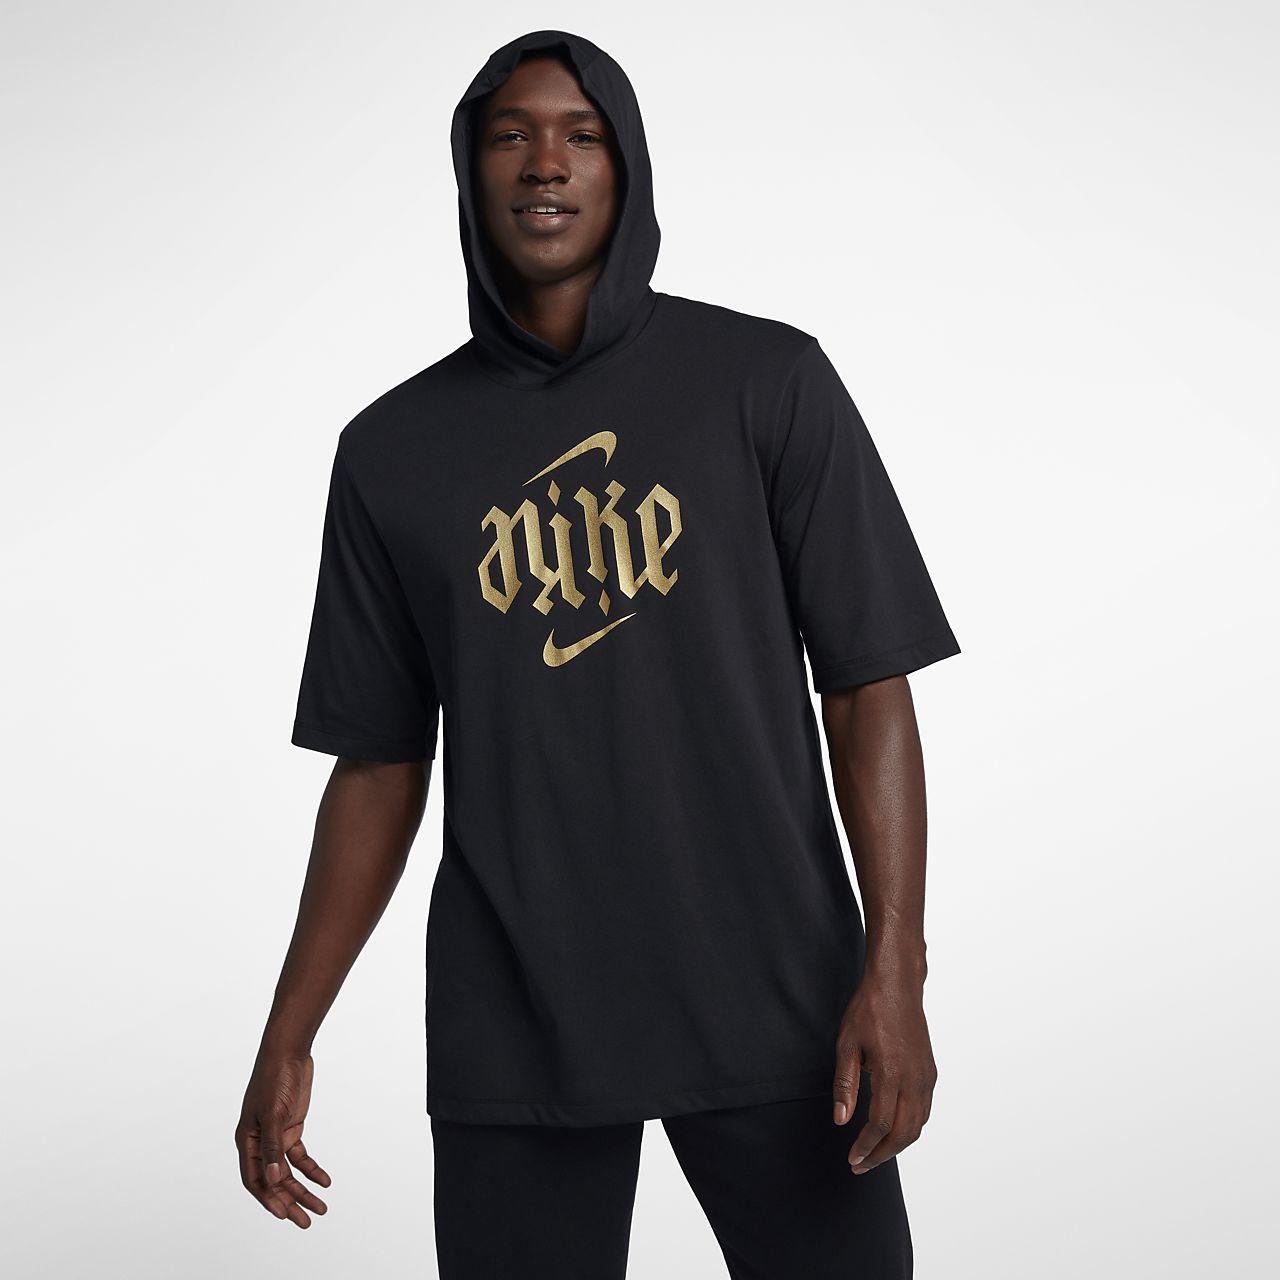 Nike Dri-FIT Men's Hooded Basketball T-Shirt